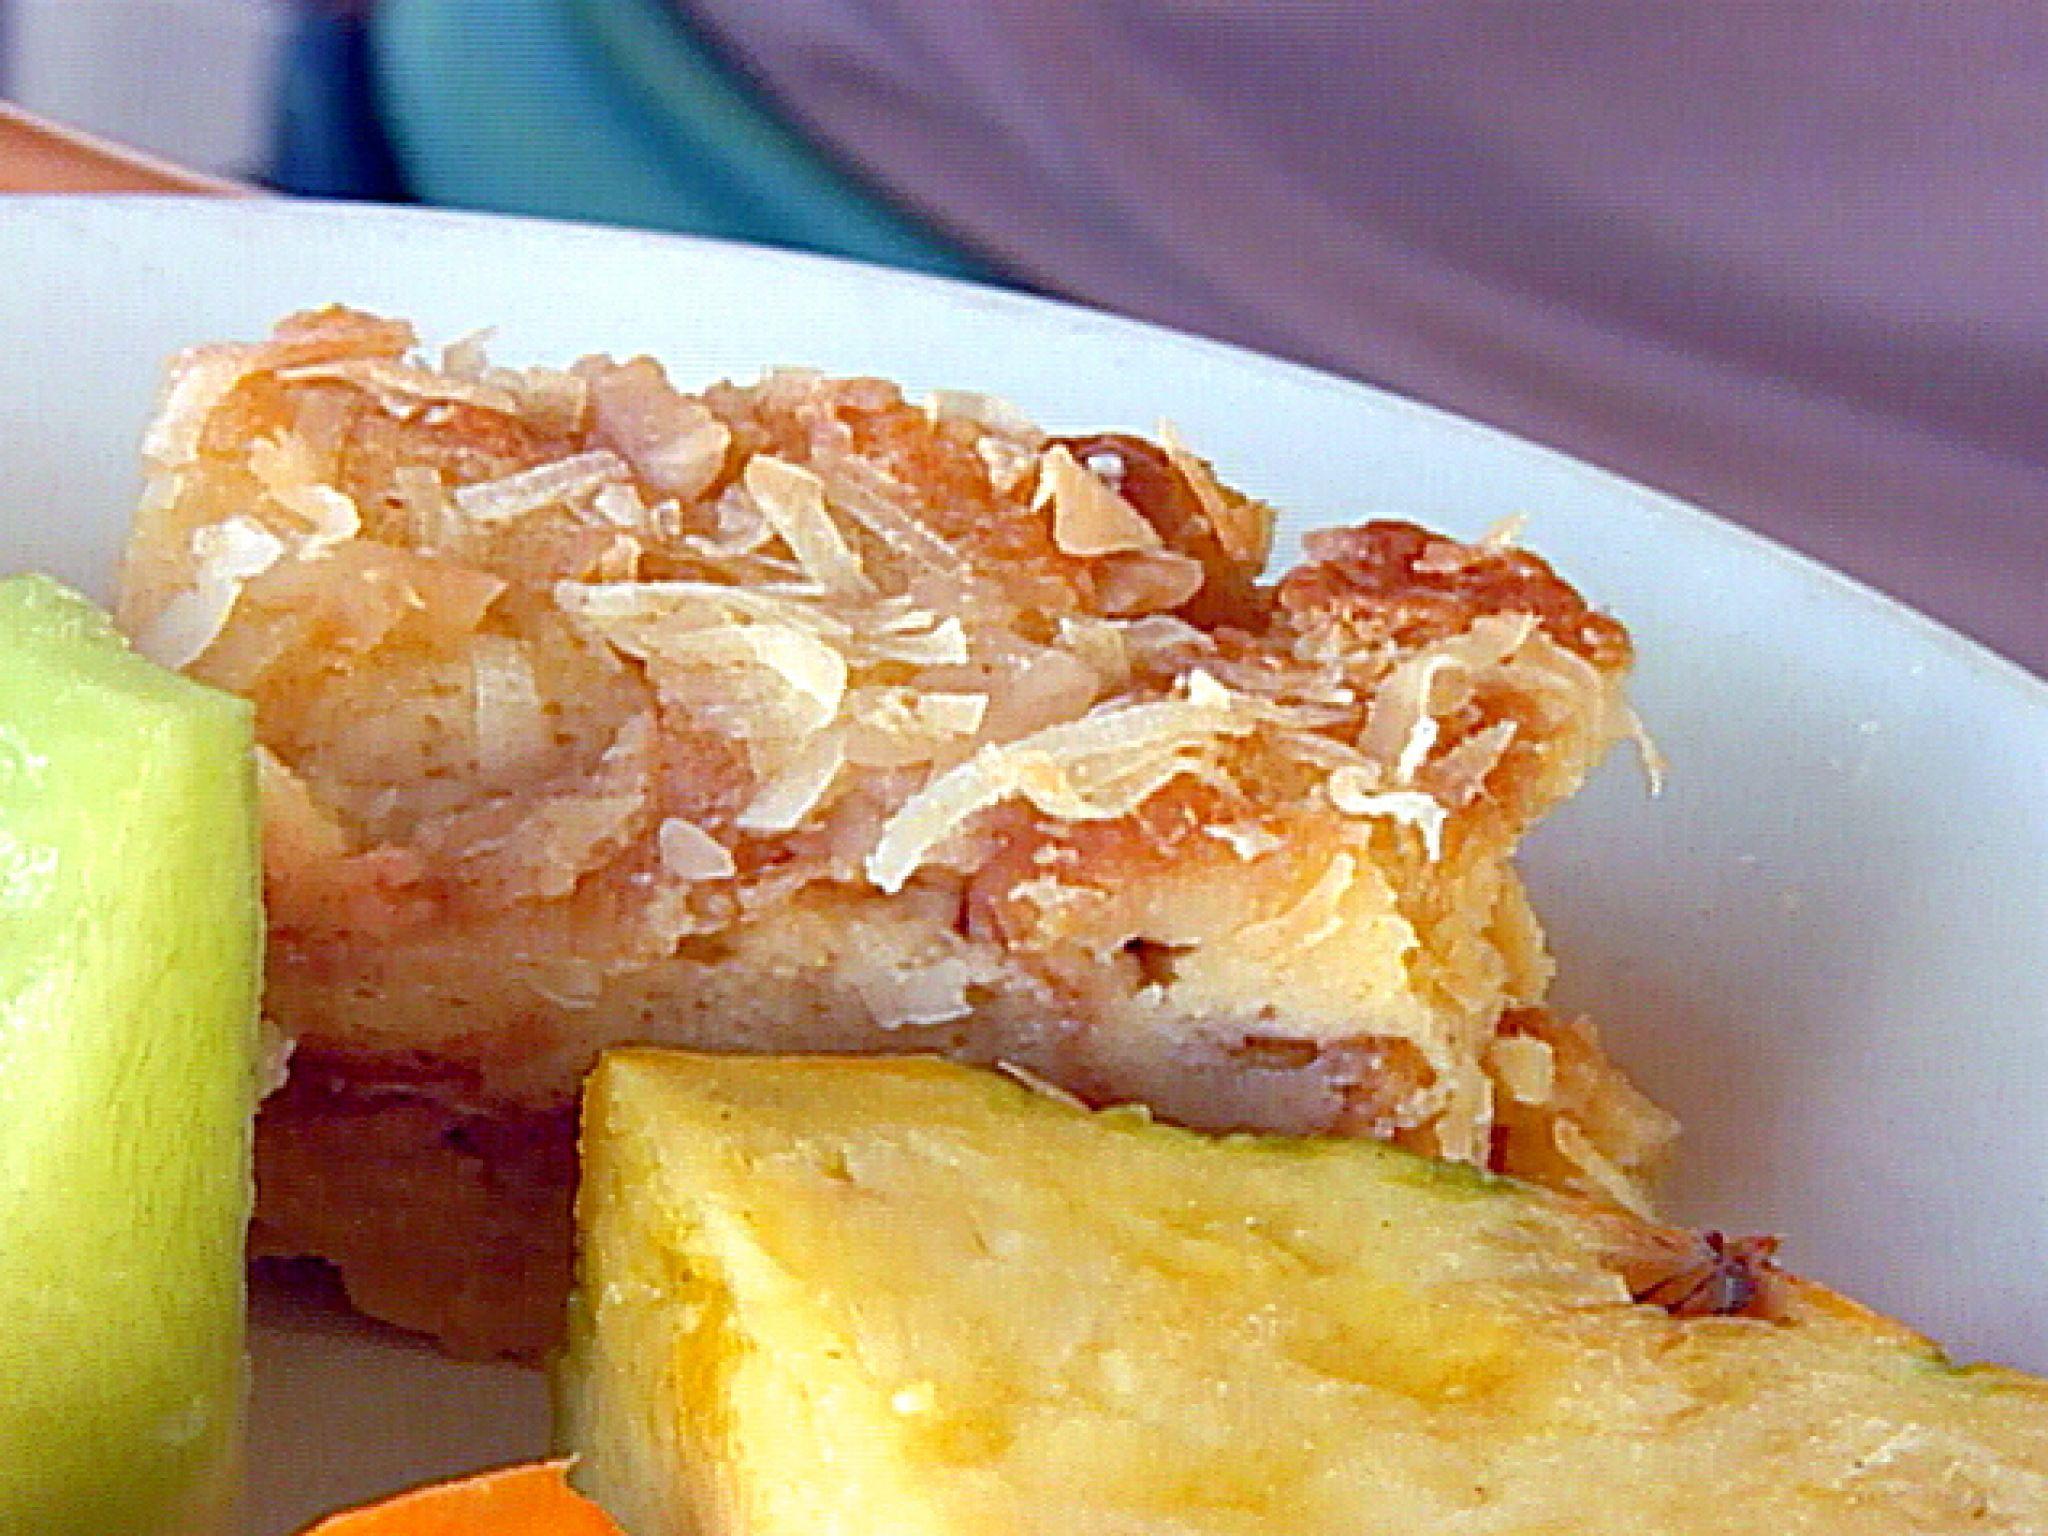 Haupia macadamia nut bread pudding recipe bread puddings haupia macadamia nut bread pudding bread pudding recipesbread puddingscooking channel forumfinder Image collections